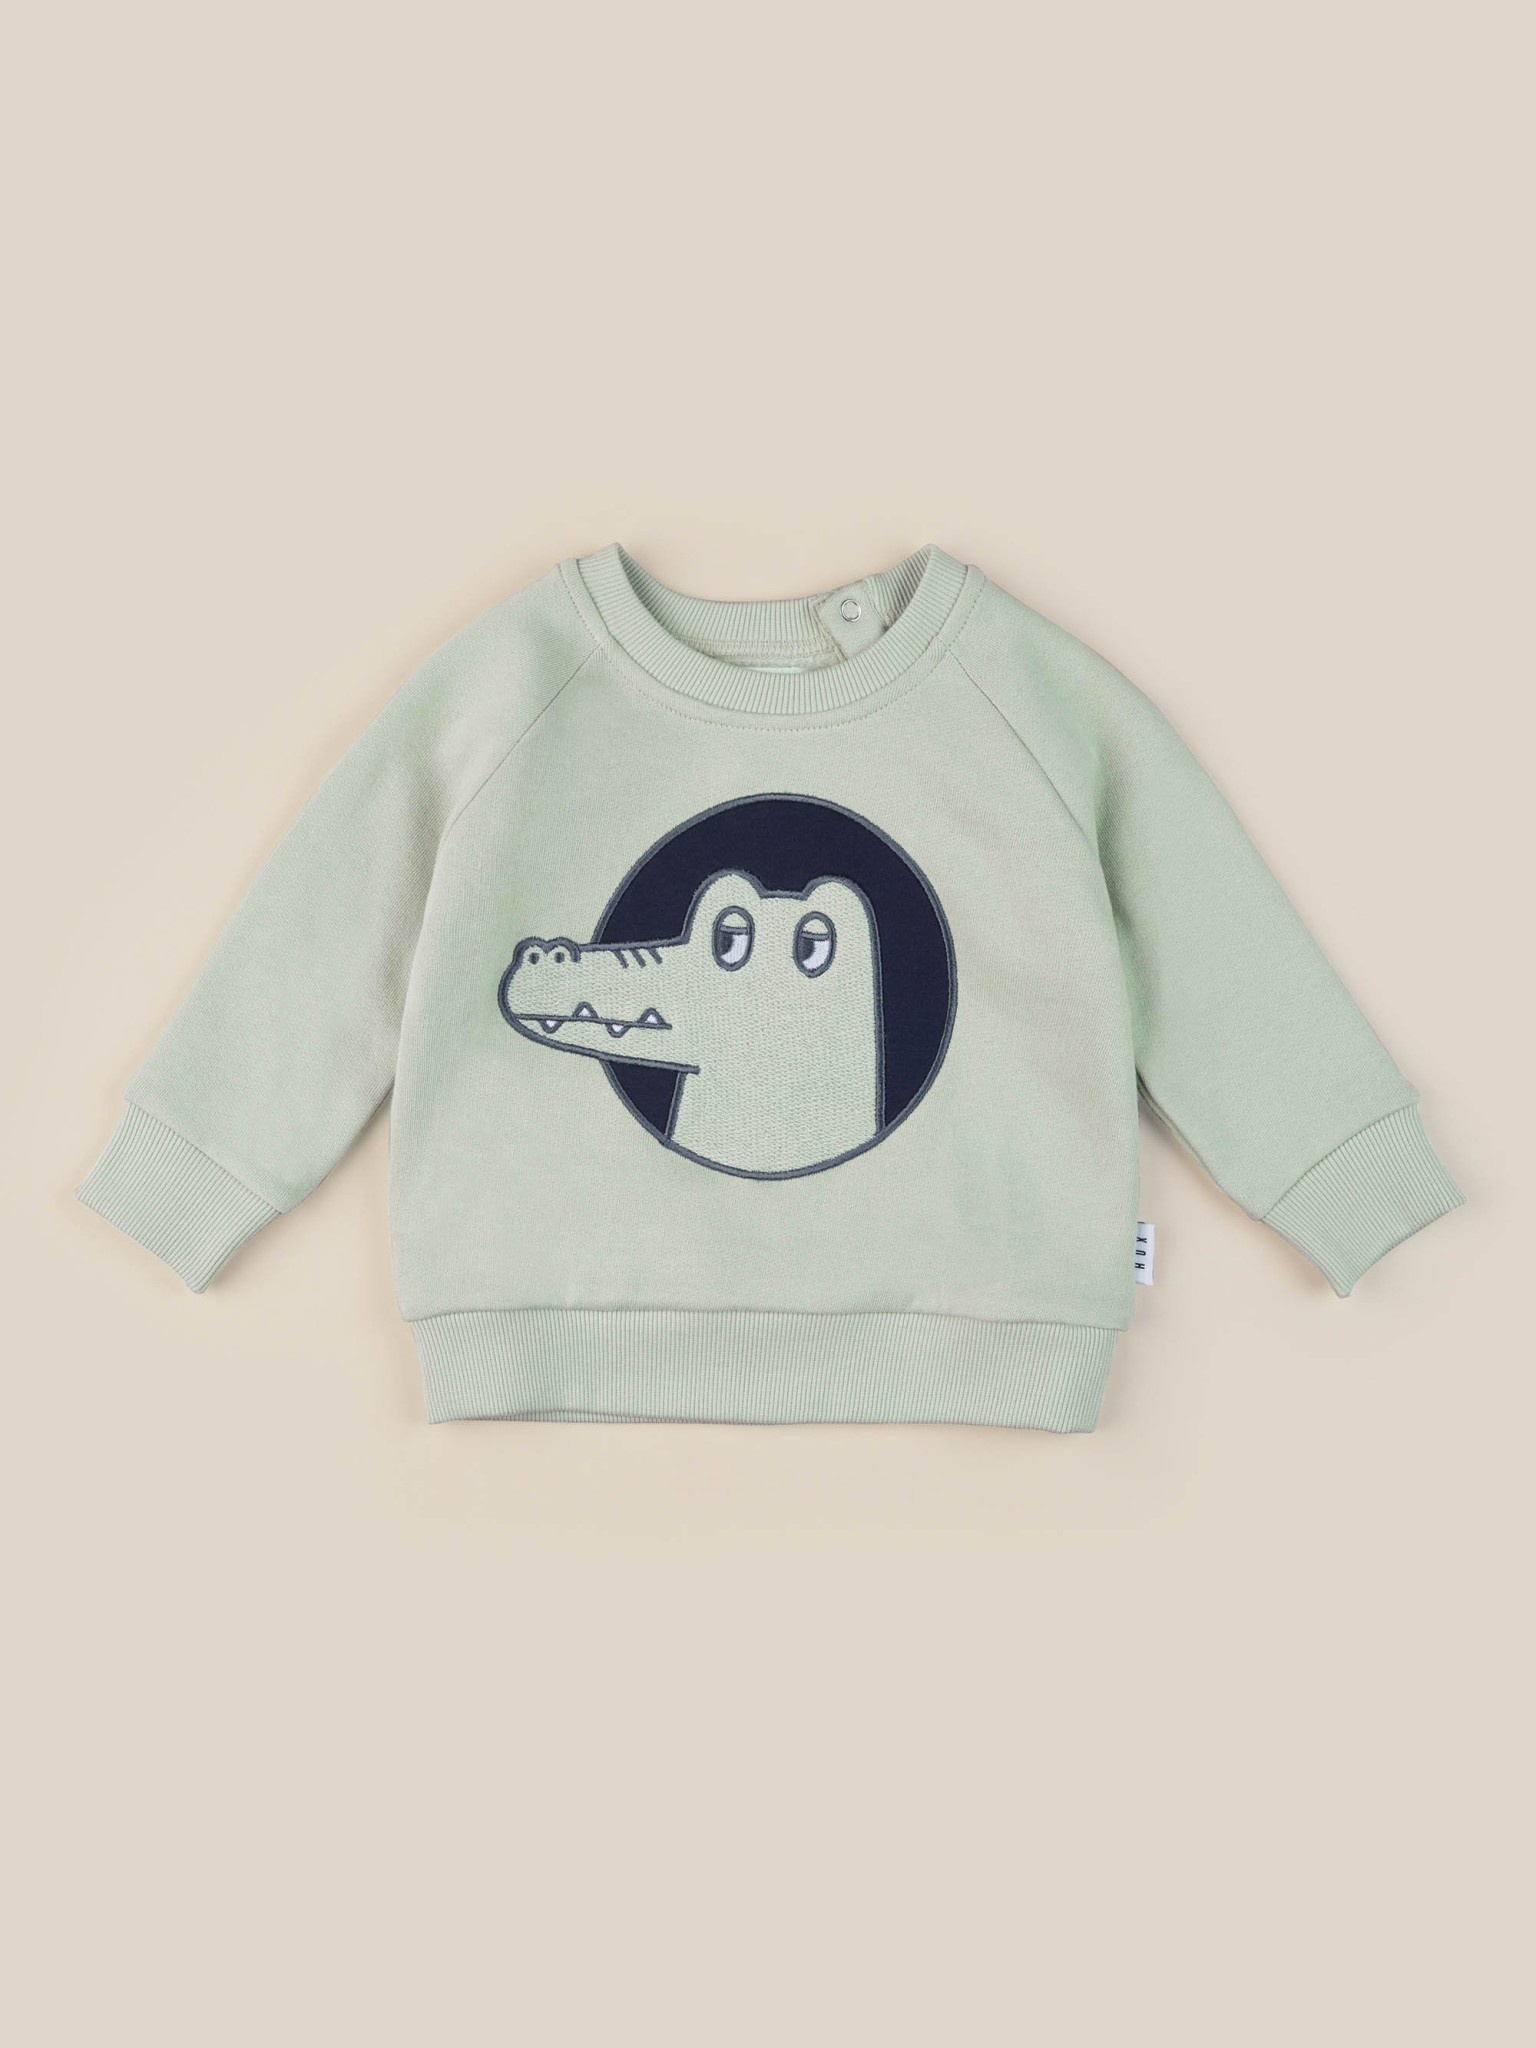 HUX BABY Croc-O-Gator  Baby Sweatshirt